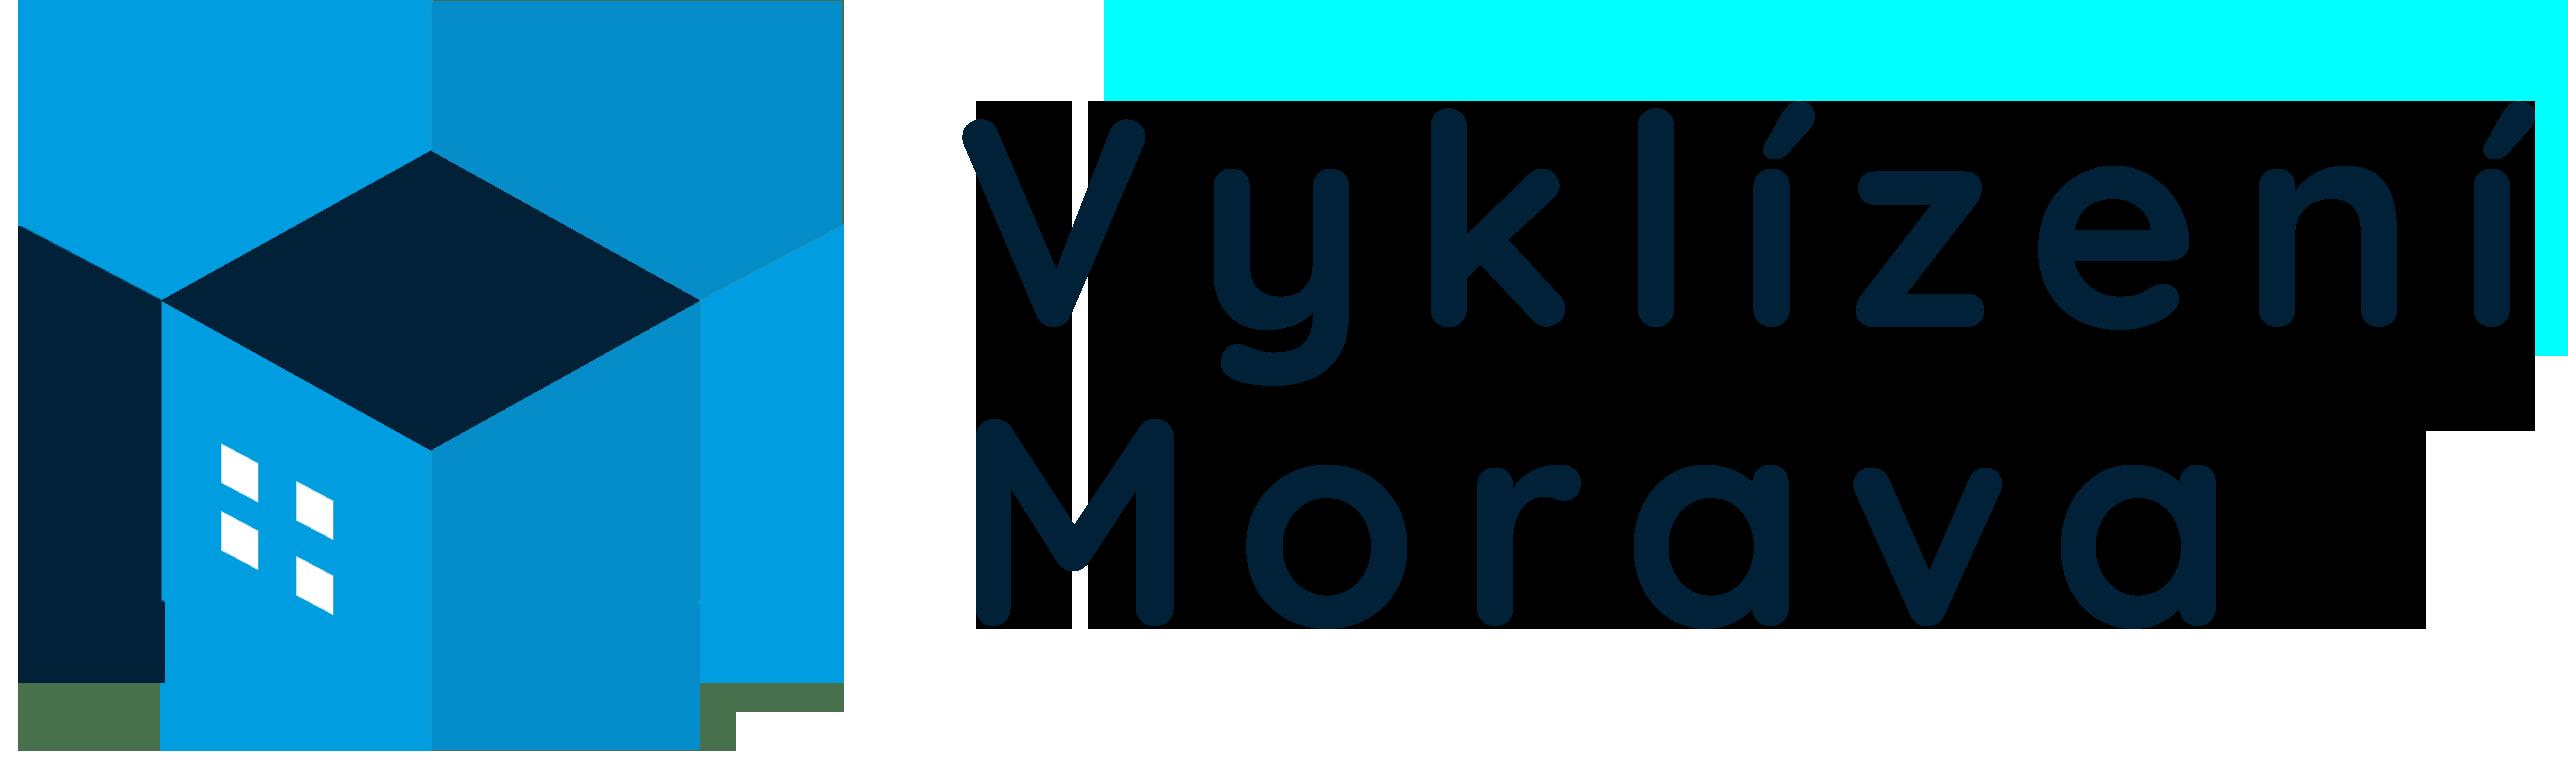 Vyklizeni Morava